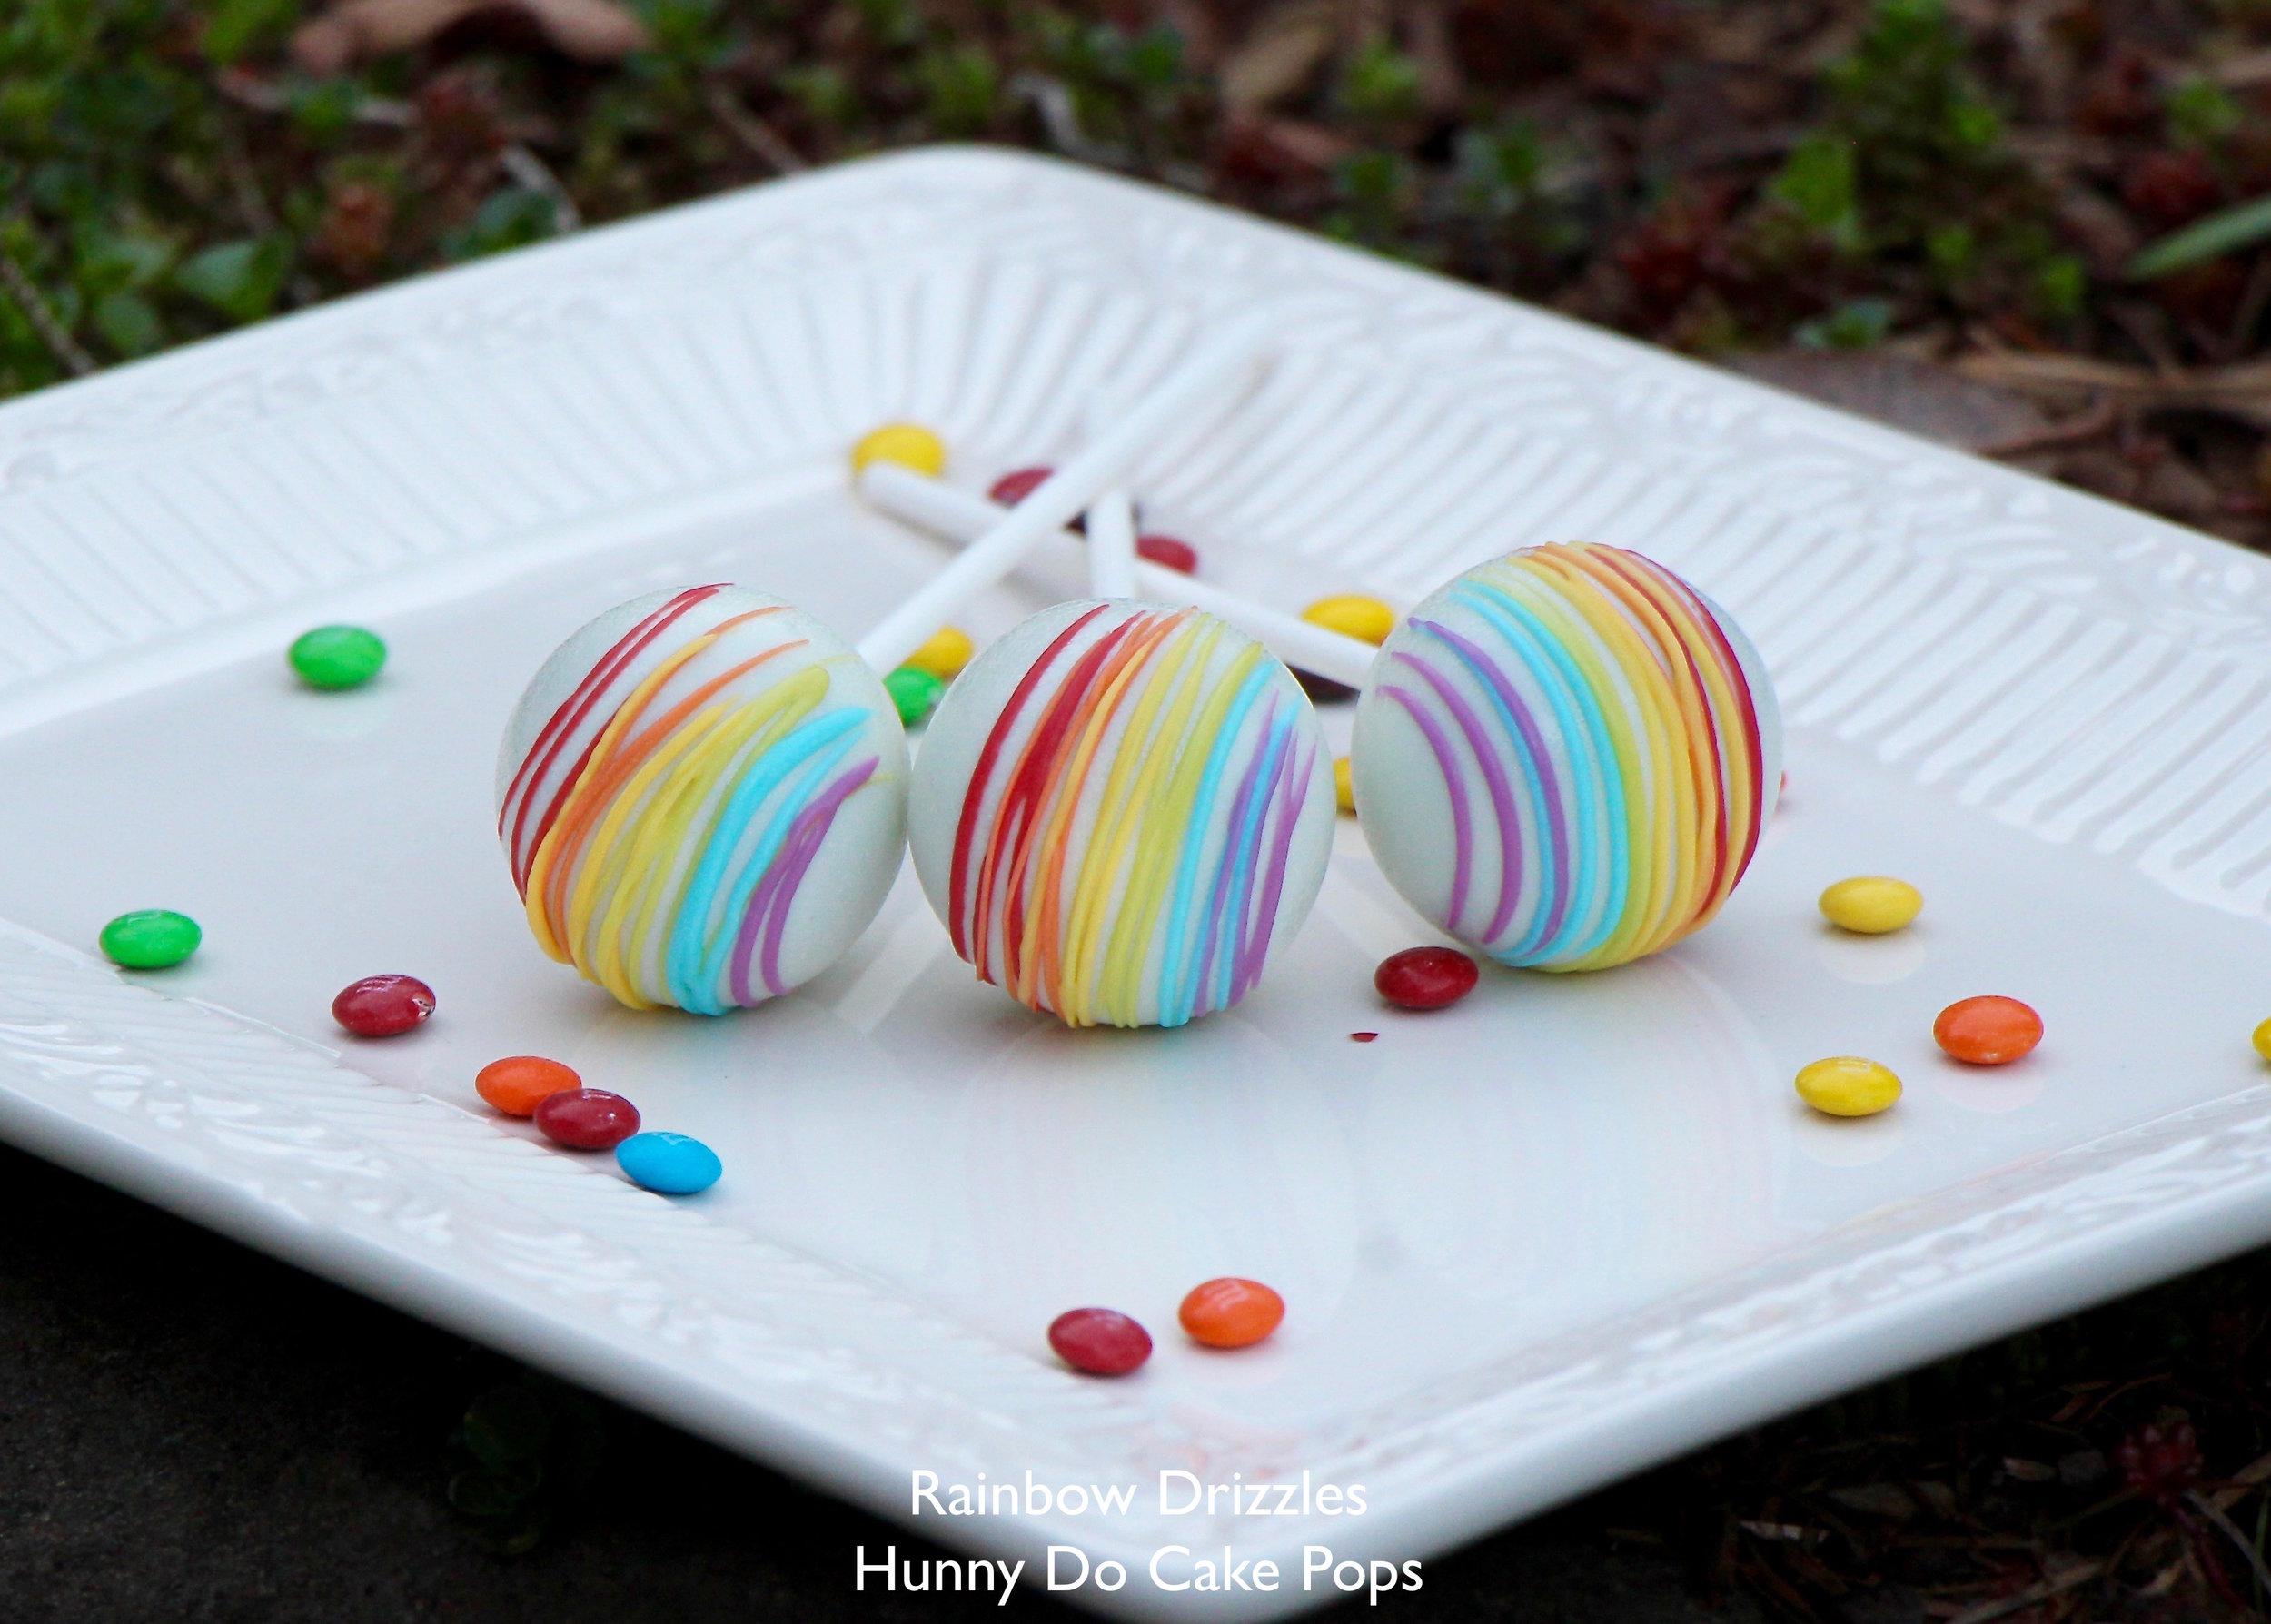 Rainbow drizzles cake pops HunnyDo 1.jpg